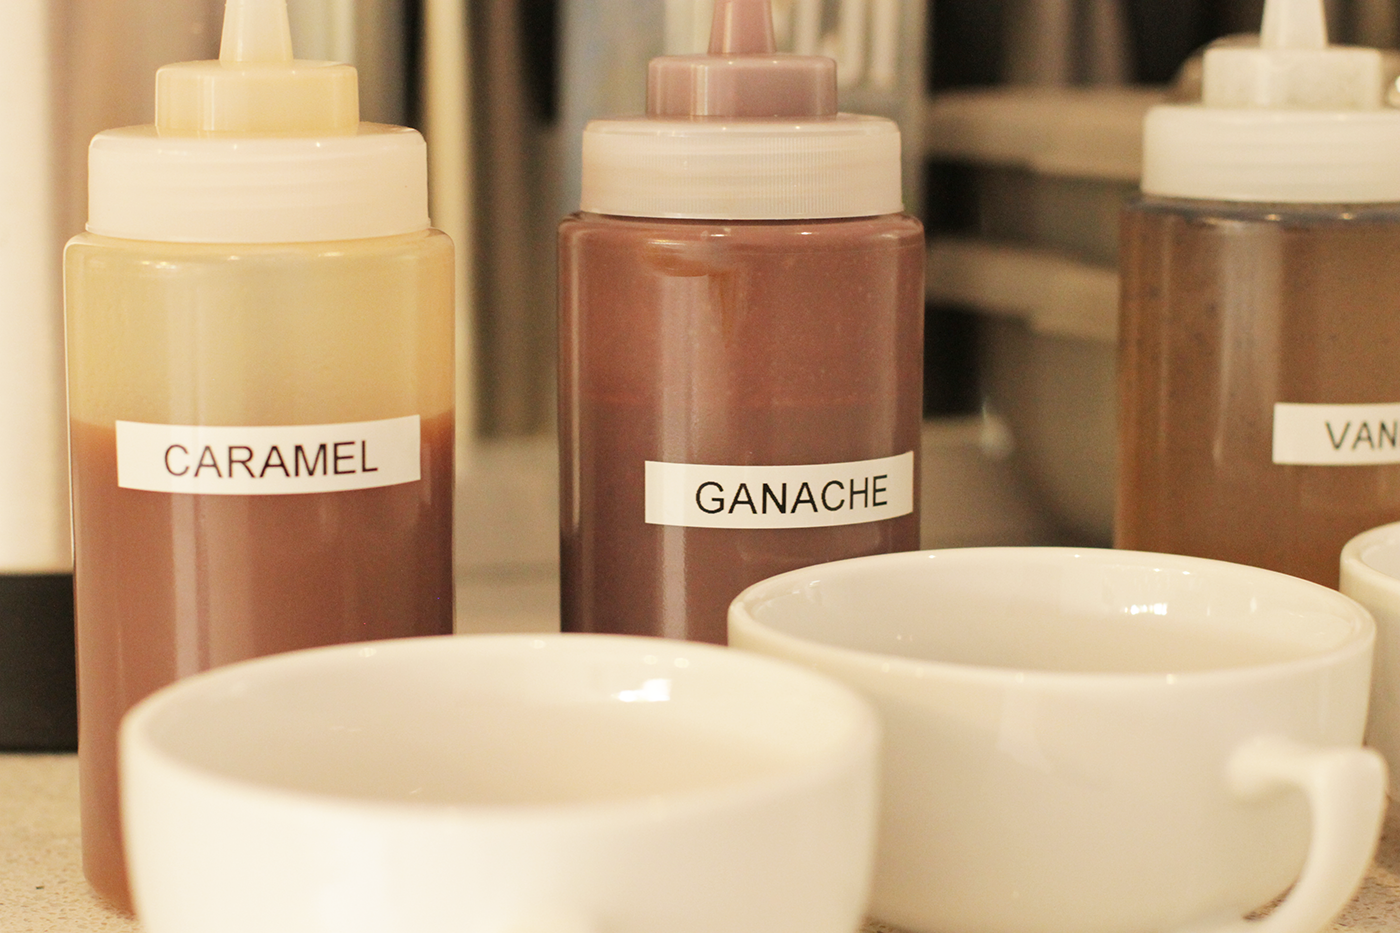 Interior - Lilac Patisserie Caramel ganache, Patisserie, Tableware